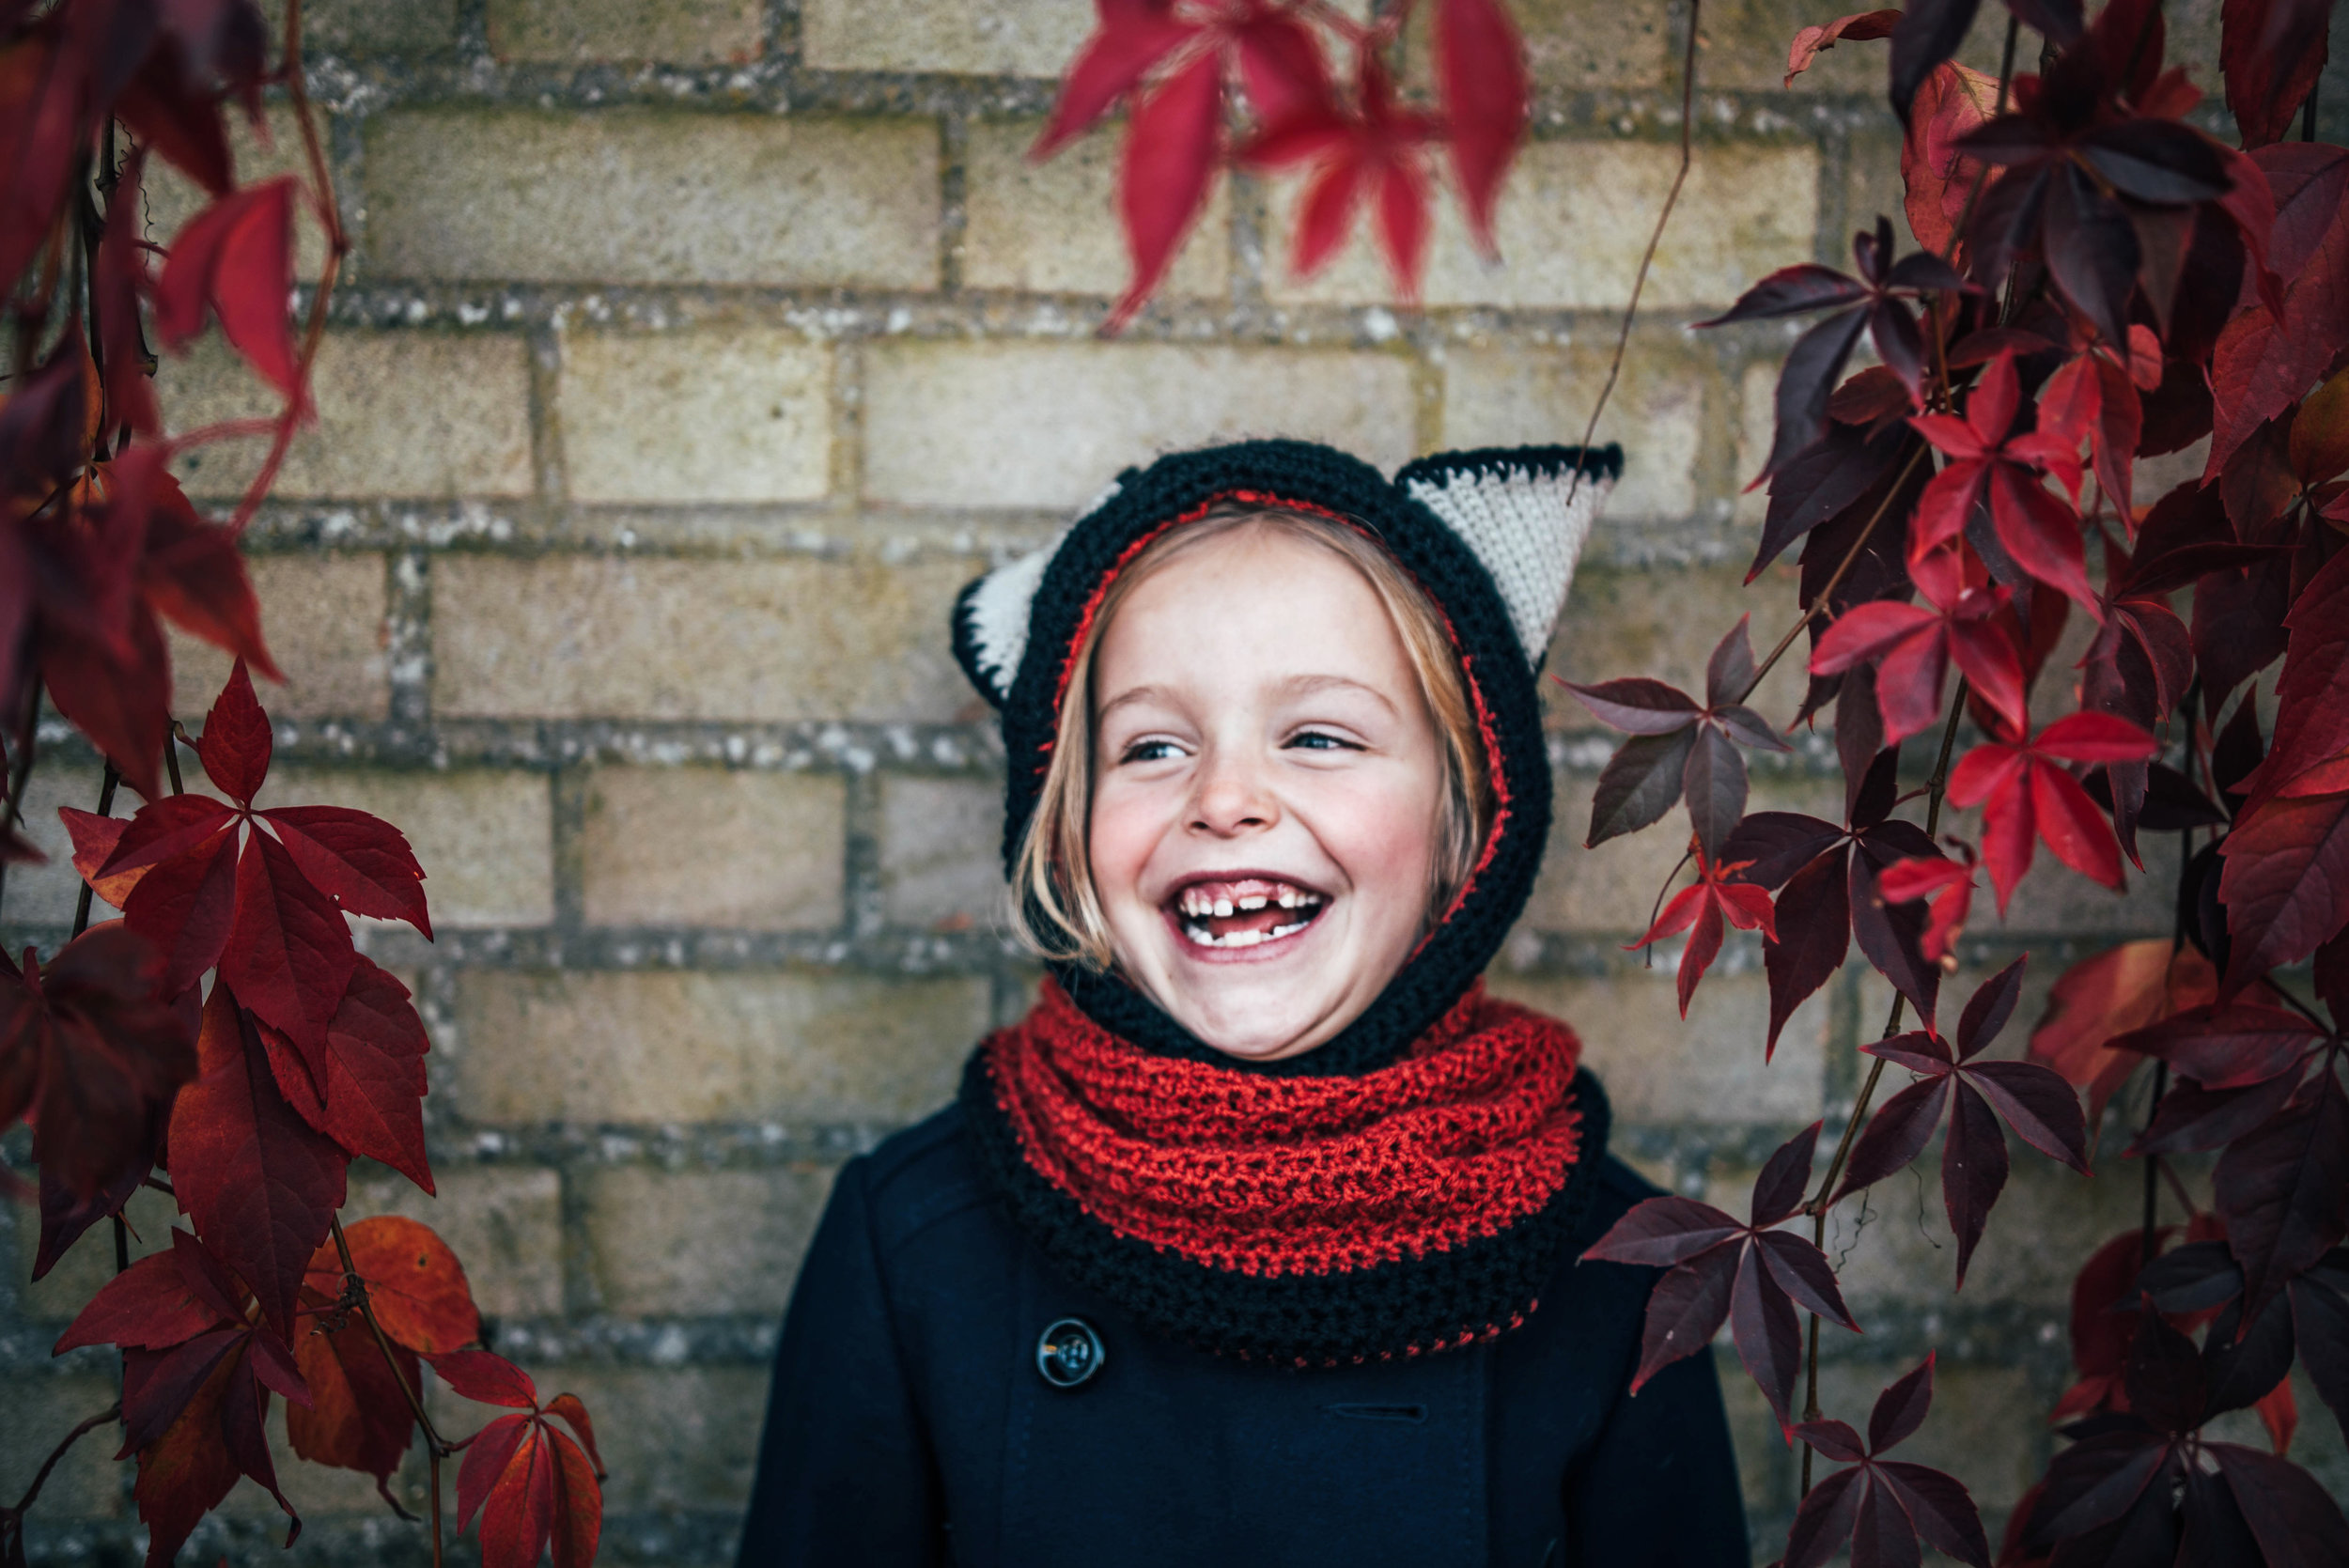 Little girl in Fox hat Autumn Leaves Essex UK Documentary Portrait Photographer